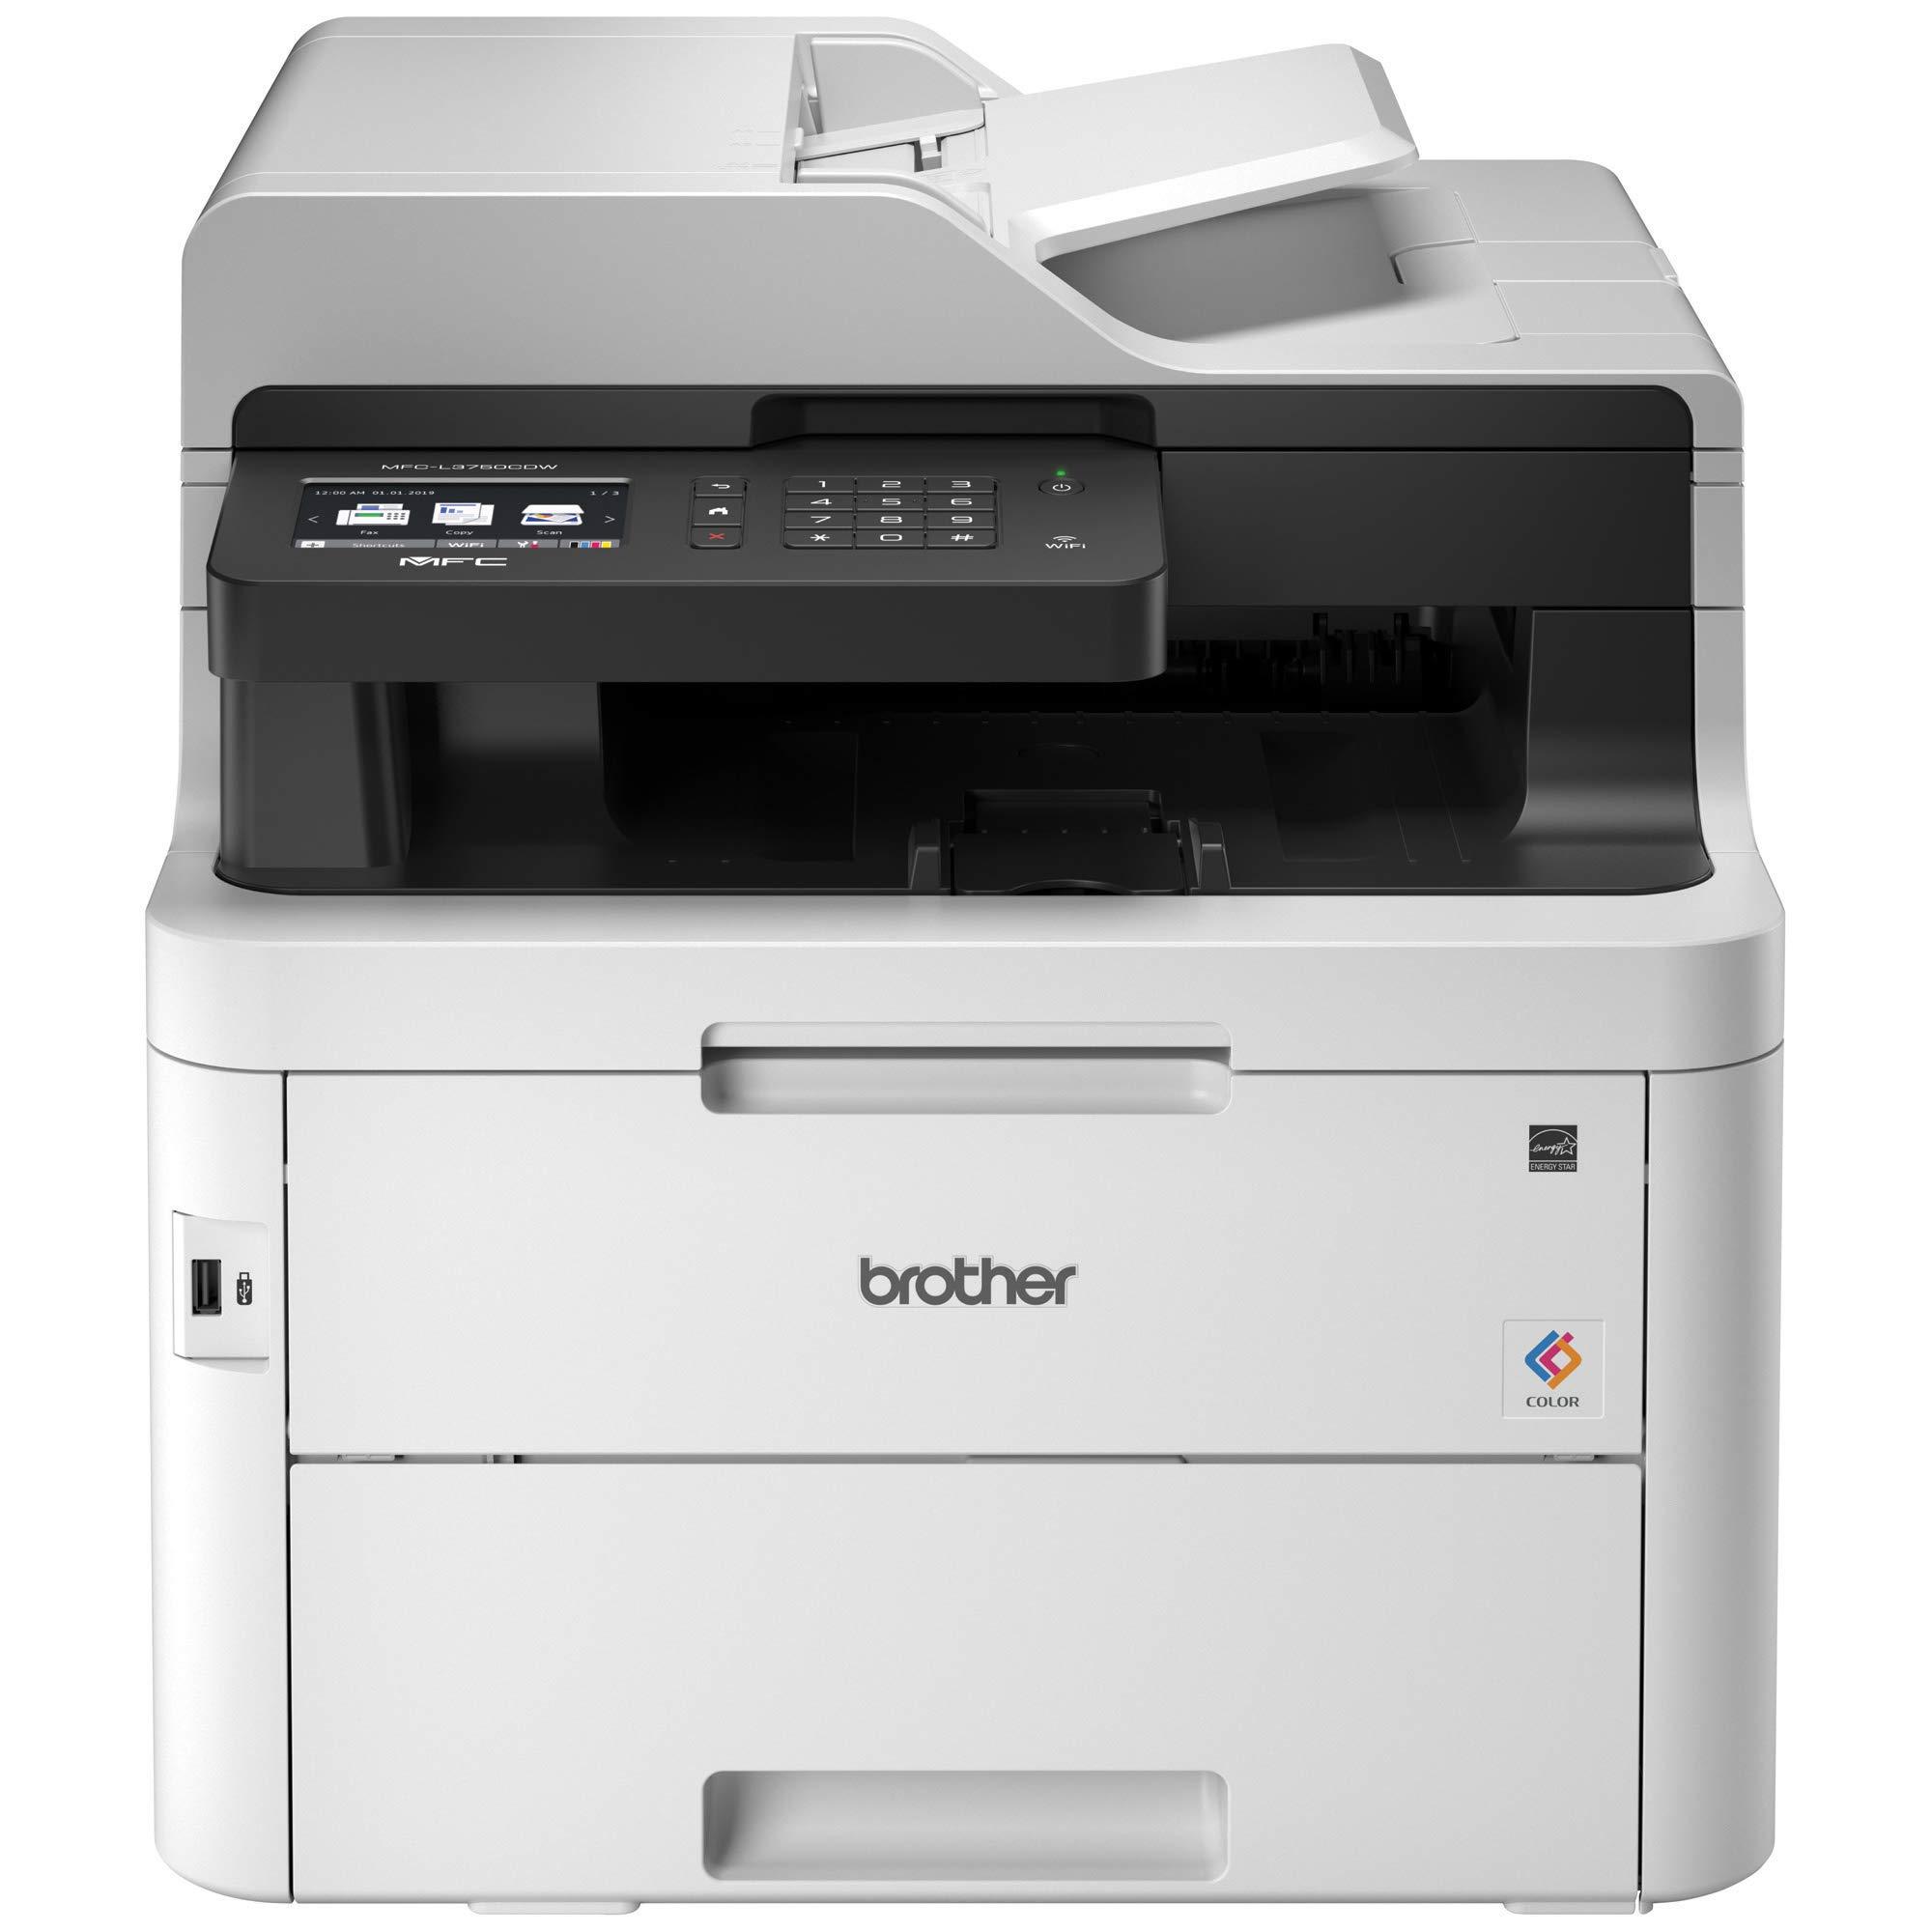 Brother MFC L3750CDW Wireless Printing Replenishment